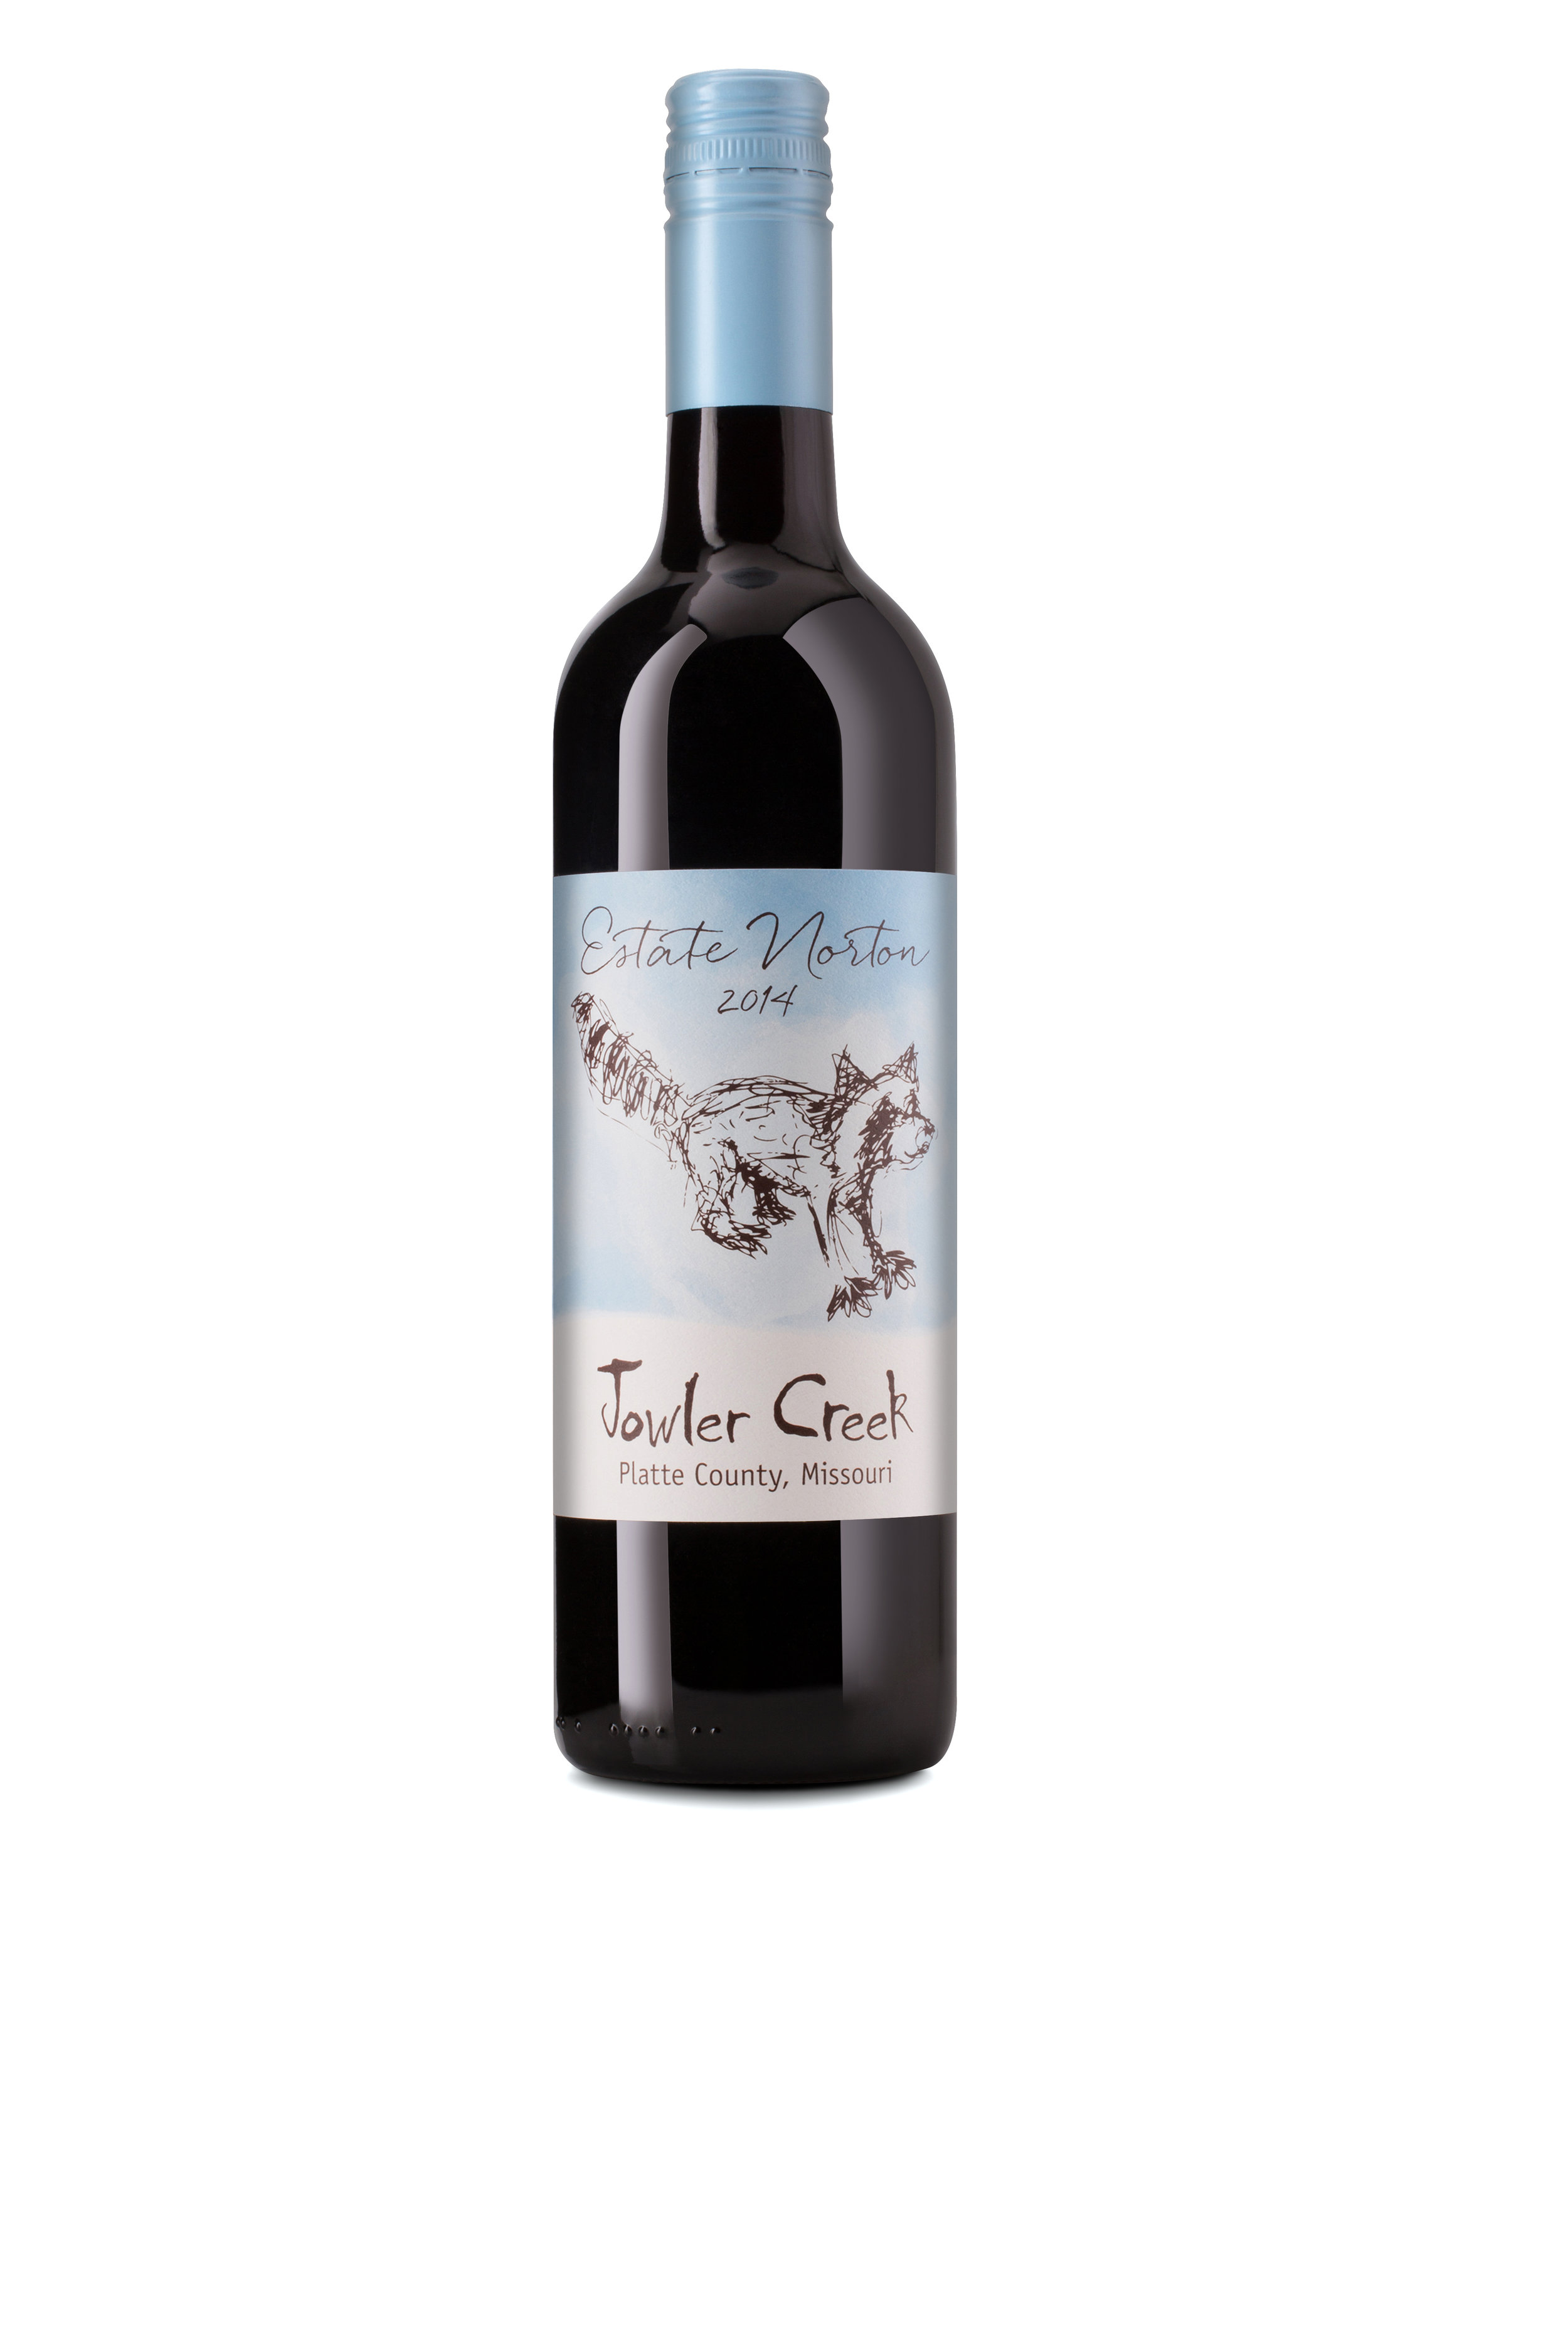 Jowler Creek Winery  has the best Norton wine in Missouri. This award-winning, estate grown wine is made with grapes grown in its certified  sustainable vineyard   near Weston Missouri, St. Joseph Missouri and Kansas City Missouri .